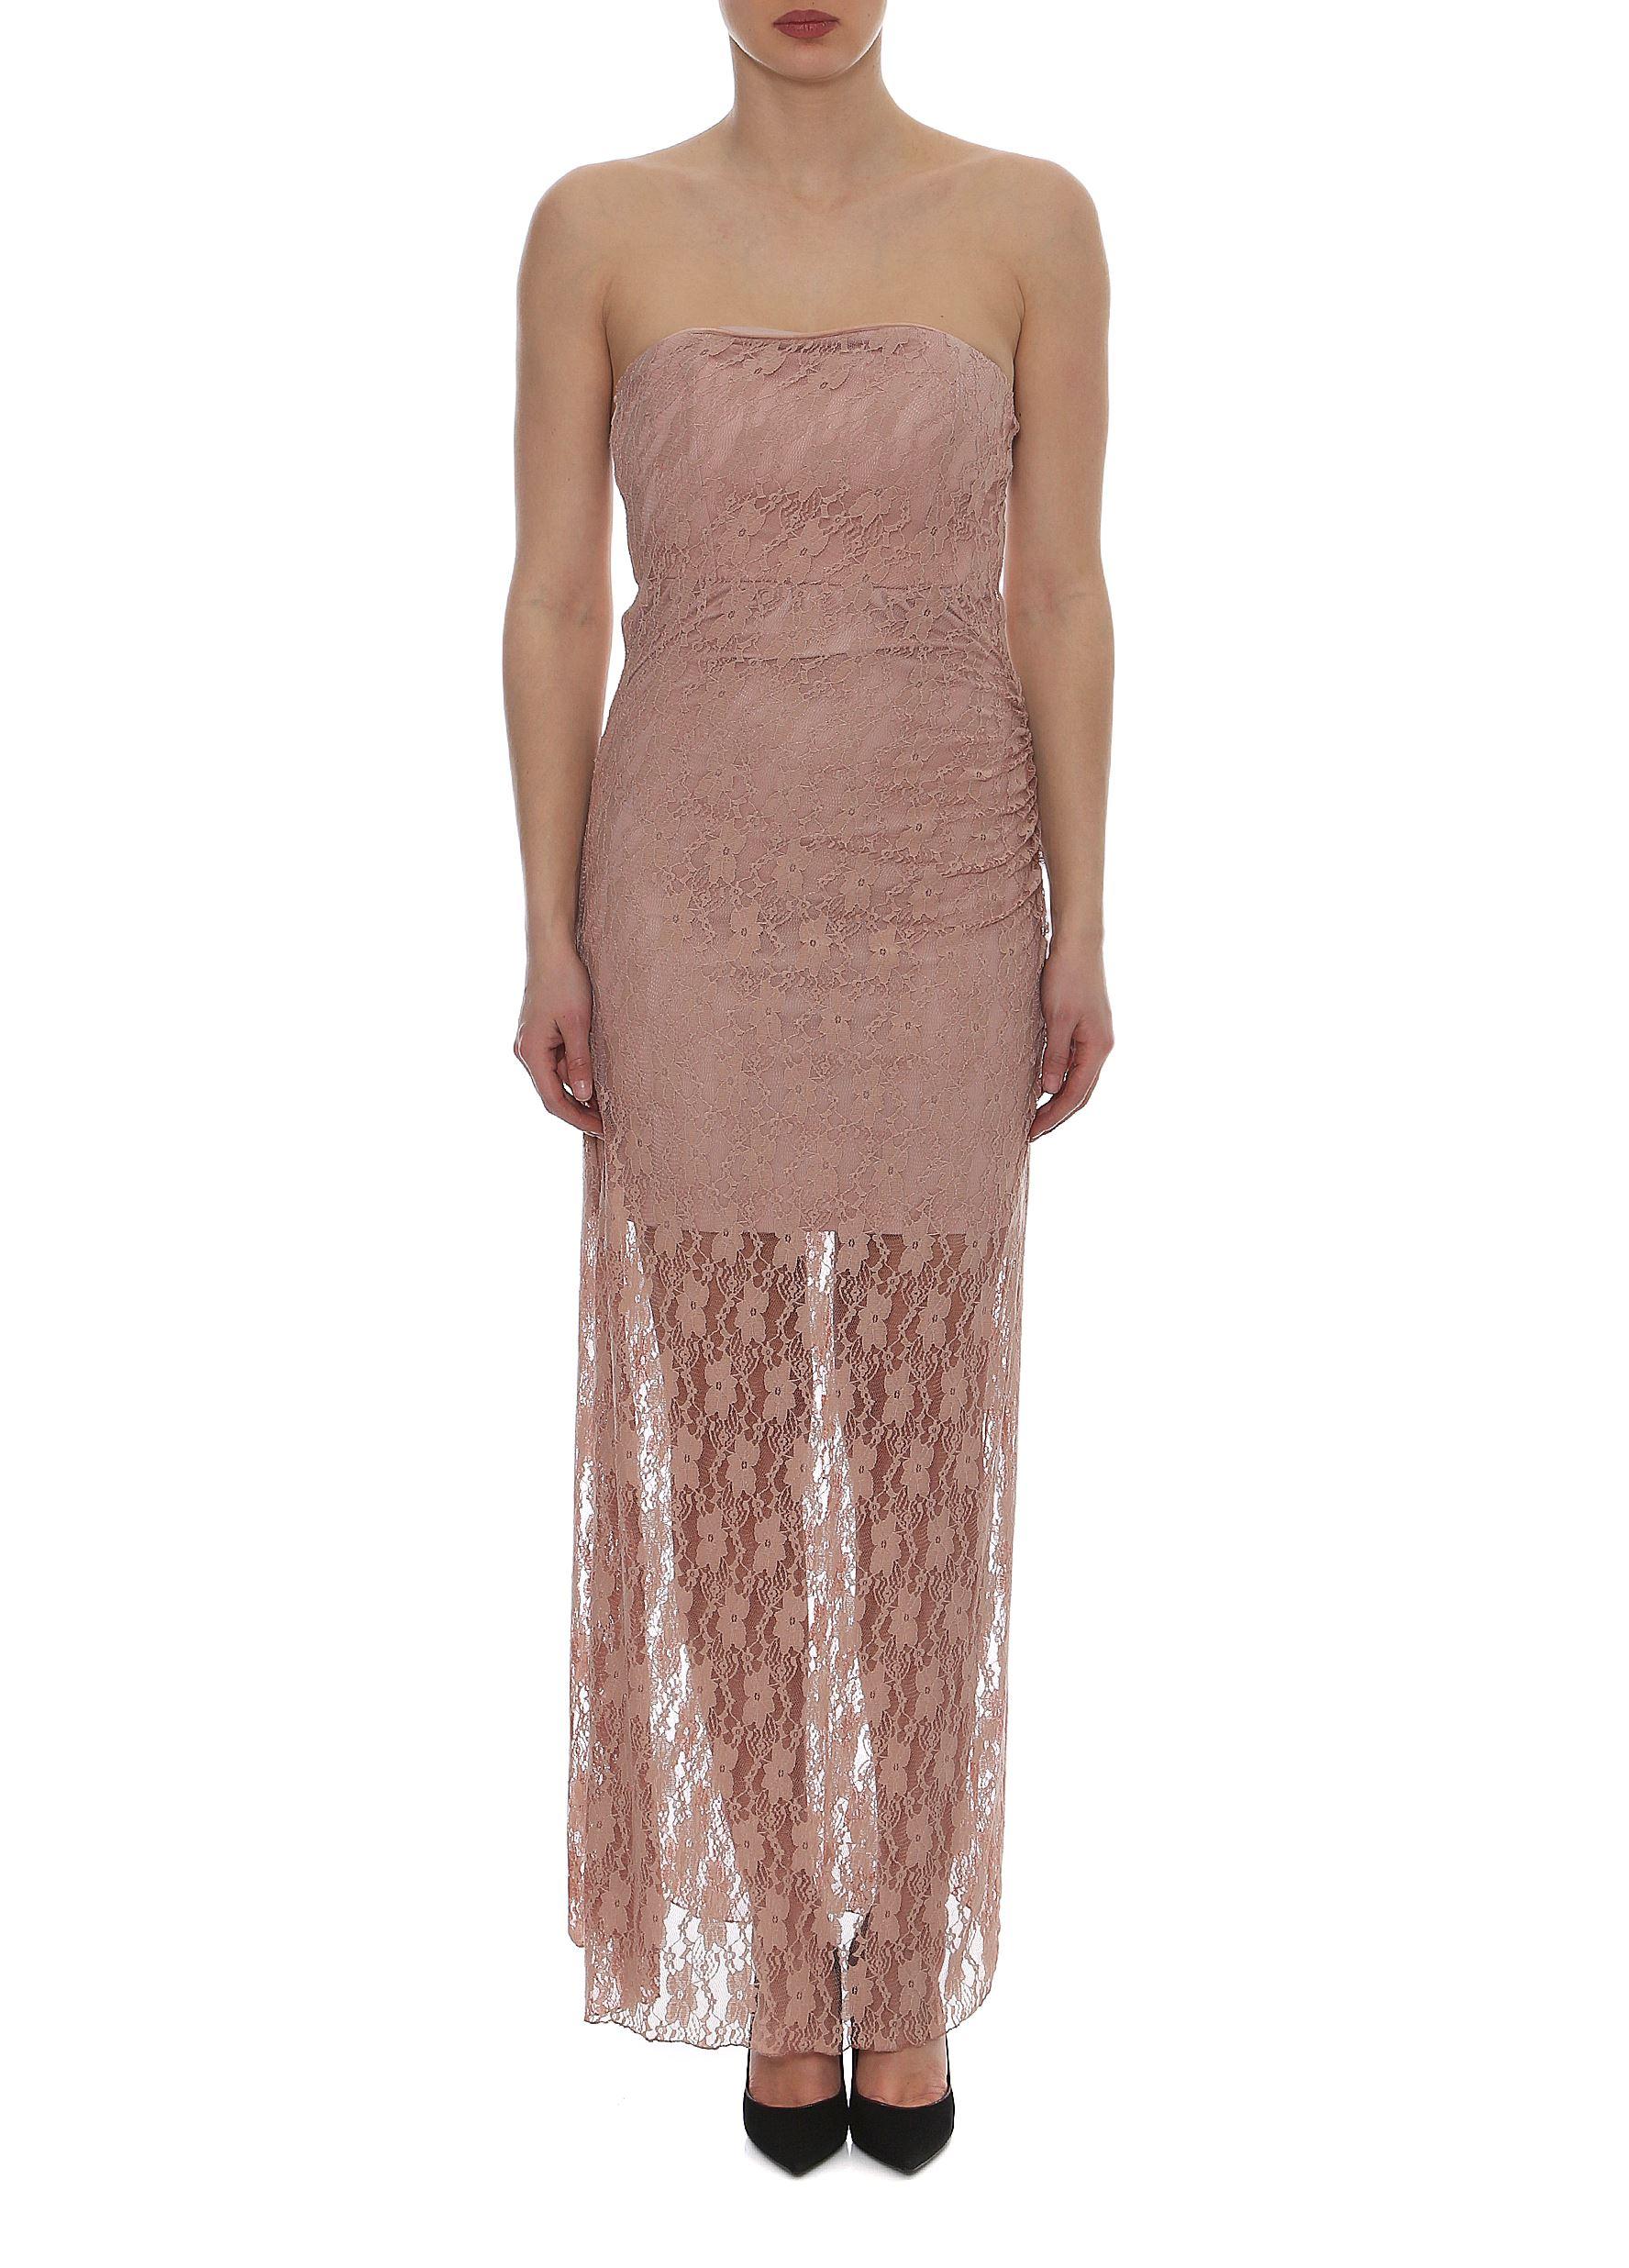 Lynne Vol.3 - Σομόν Στράπλες Φόρεμα LYNNE